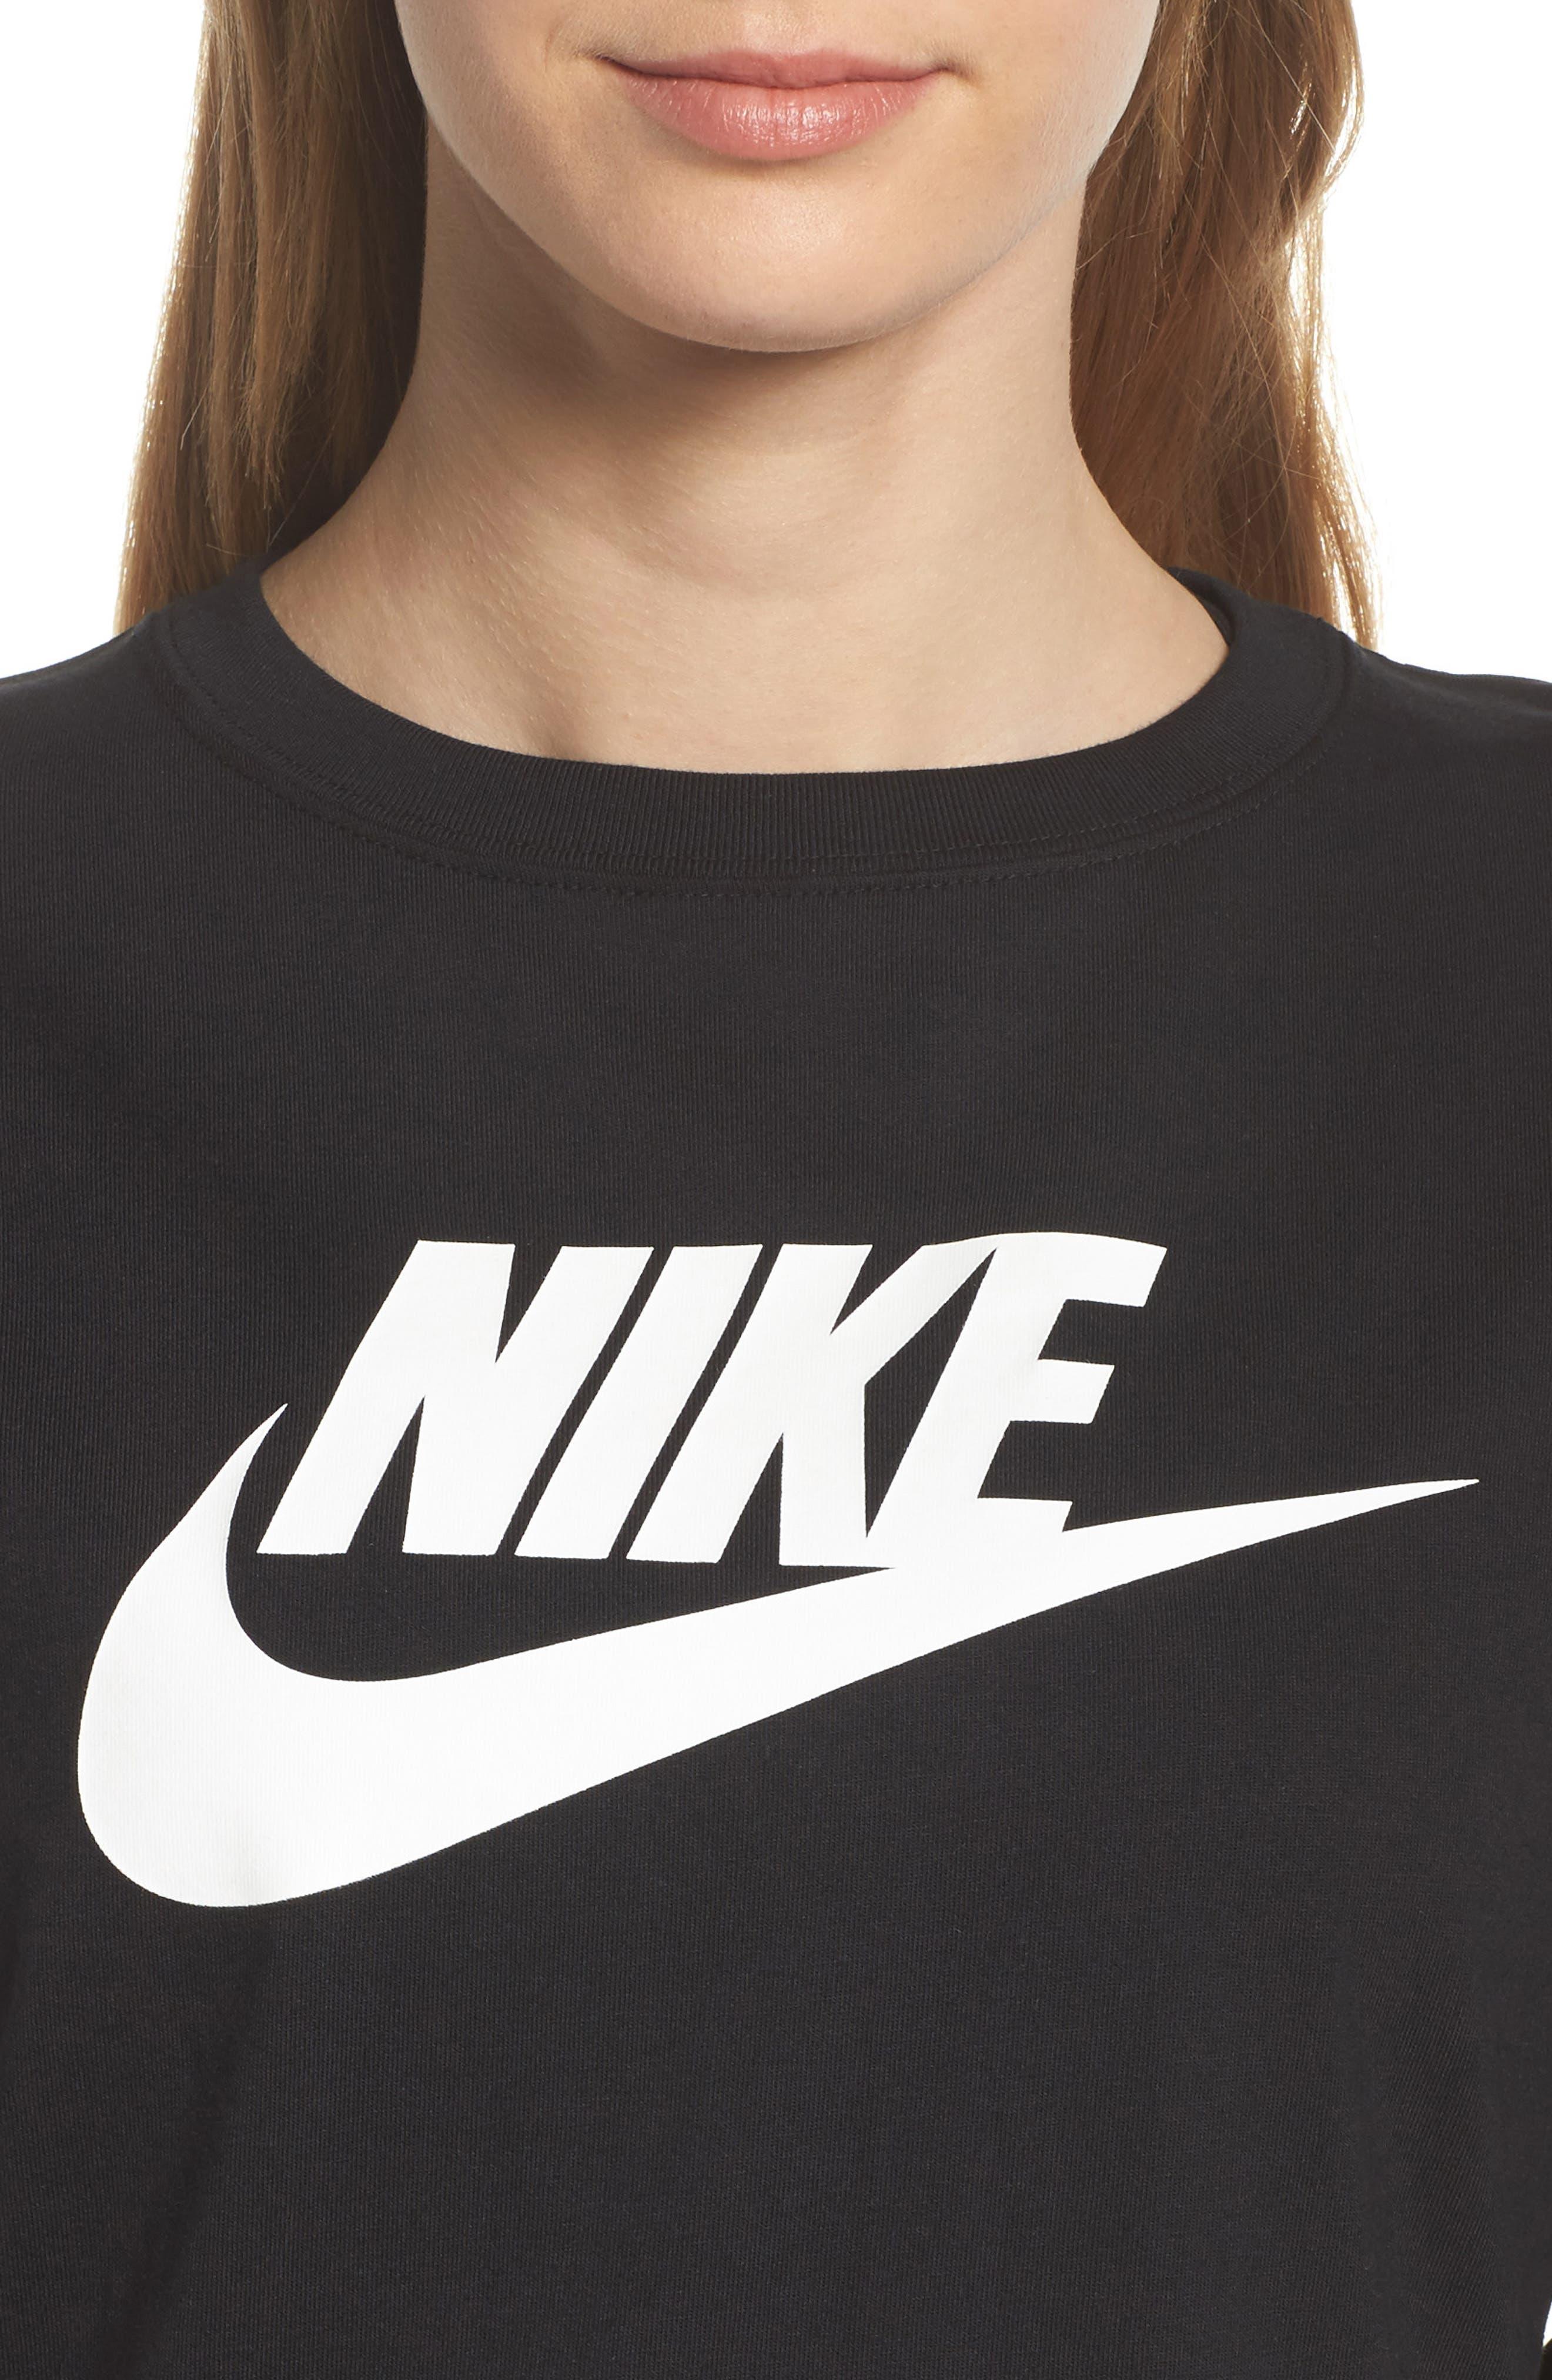 Sportswear HBR Women's Long Sleeve Tee,                             Alternate thumbnail 7, color,                             010